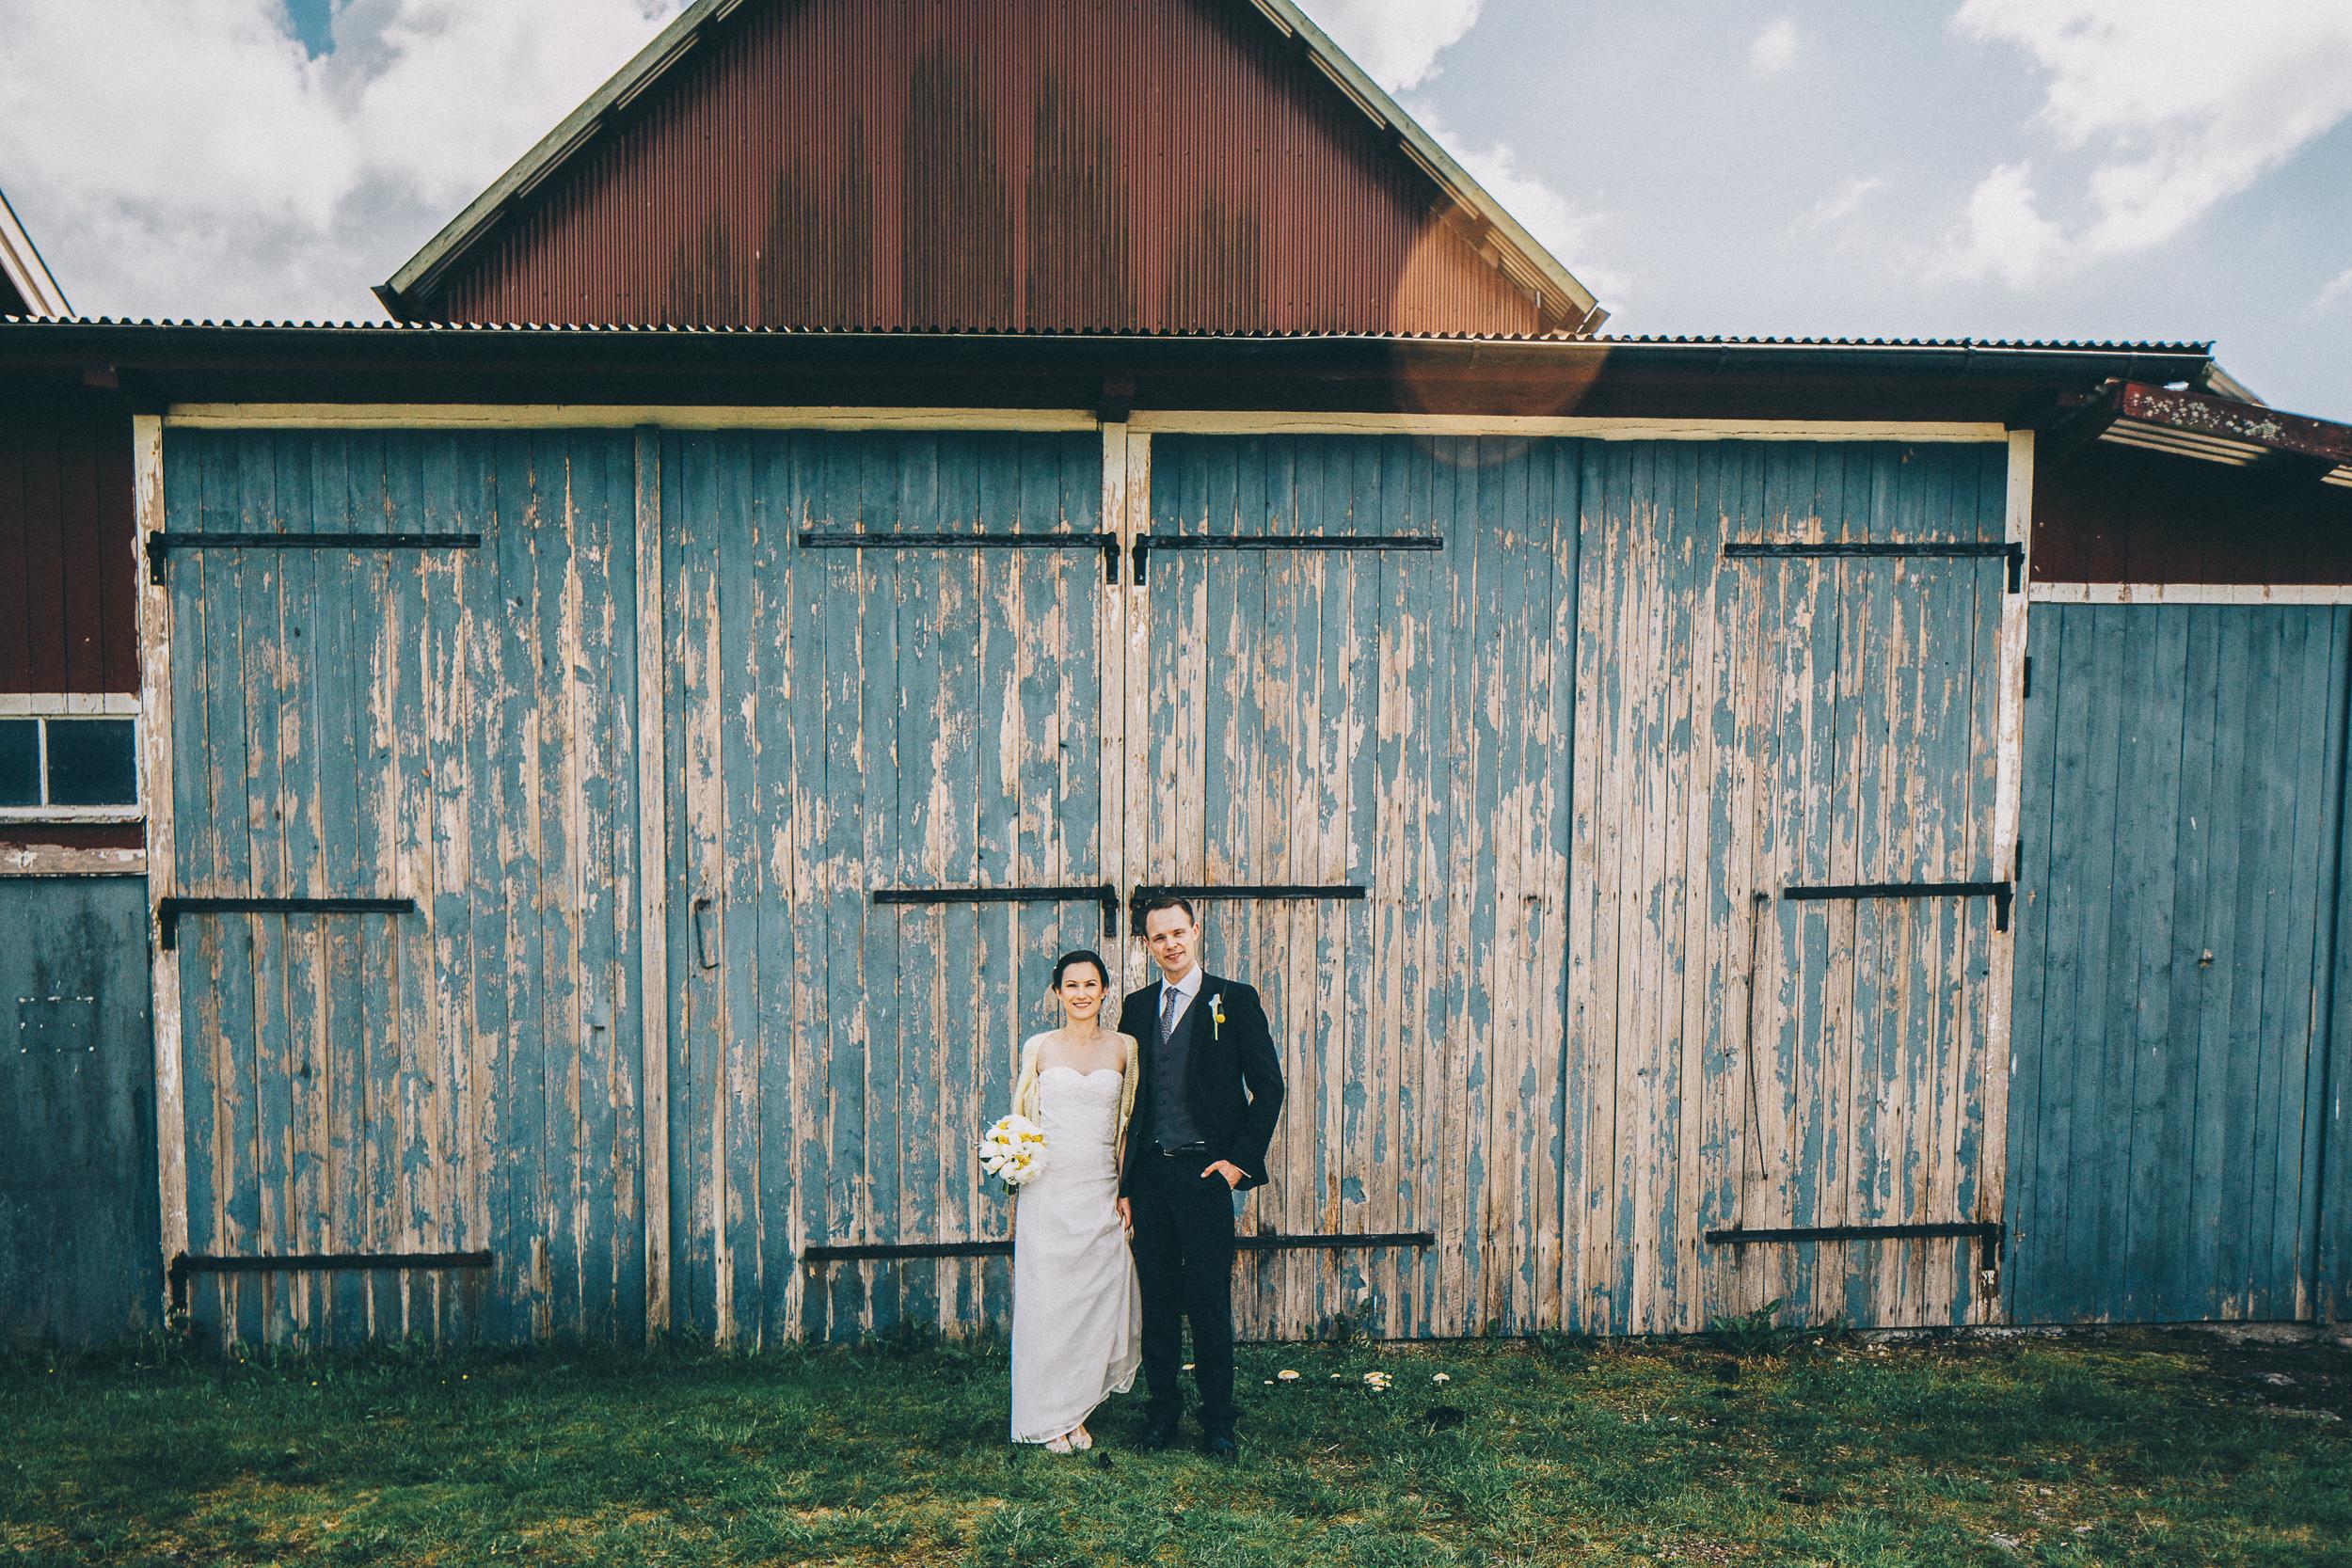 Wedding_Anna_Martin_20140607_2396